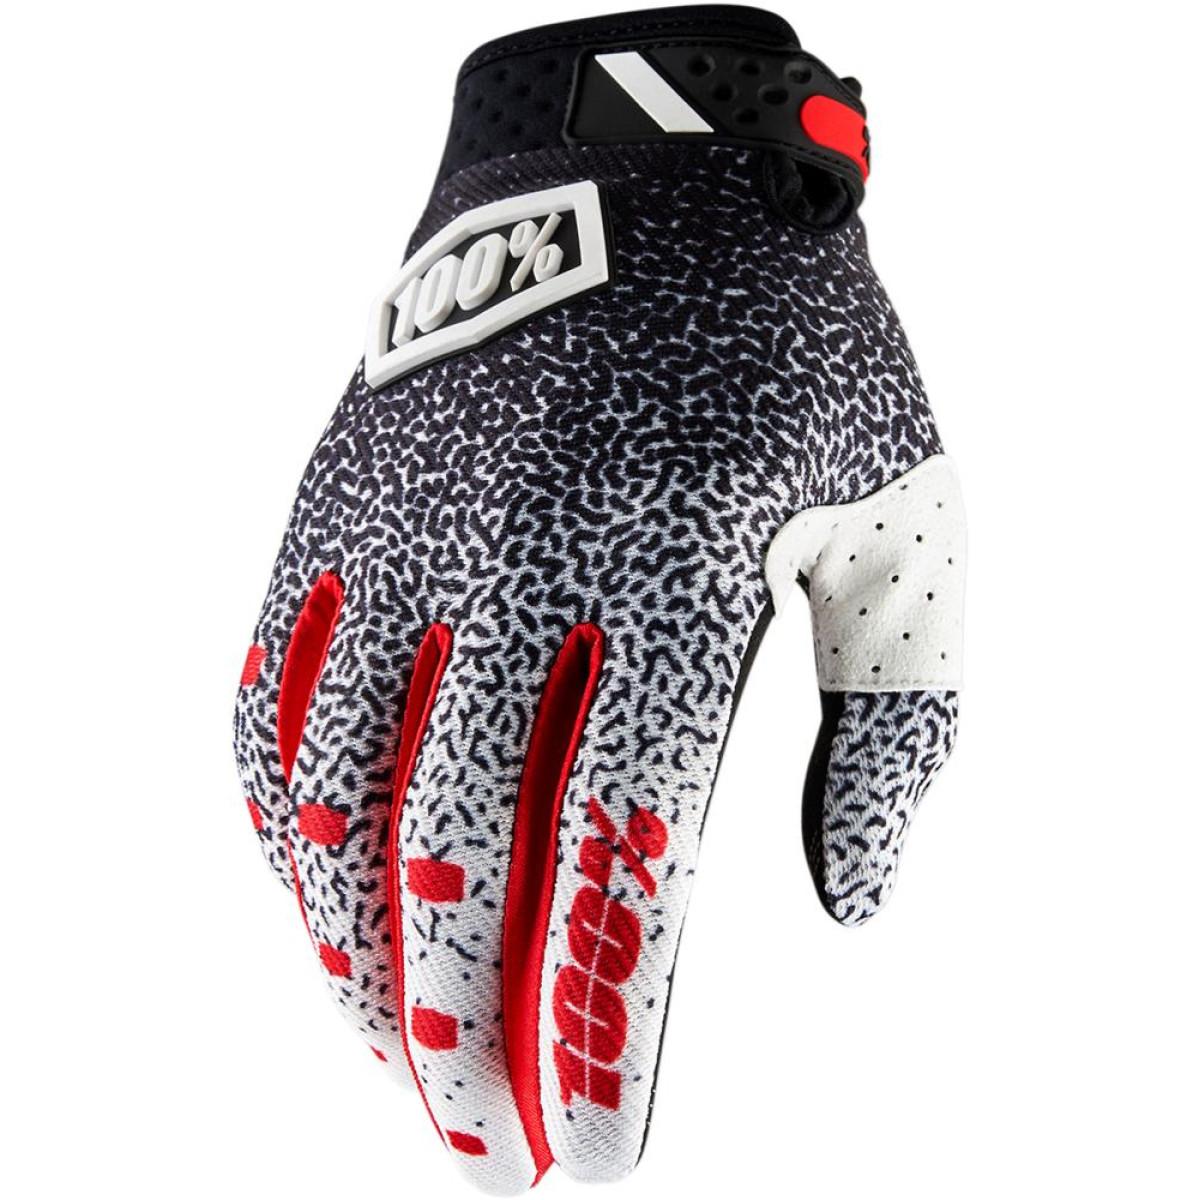 Motokrosové rukavice 100% RIDEFIT Black White 2018 vel. L  48d9ace14e